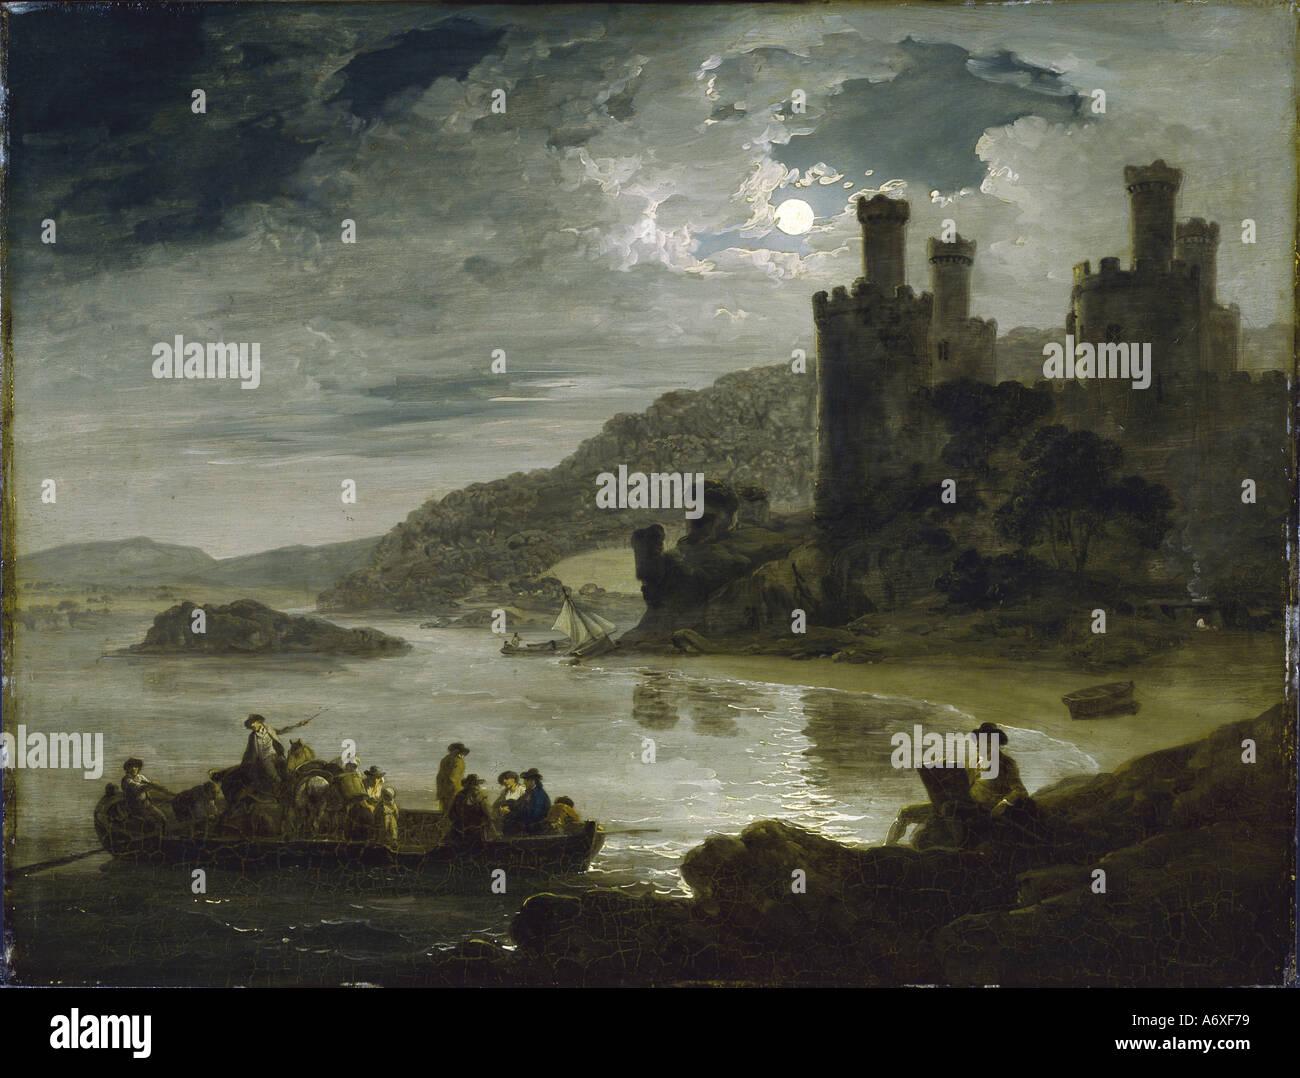 Conway castello di notte da Julius Caesar Ibbetson. Inghilterra, 1794. Immagini Stock